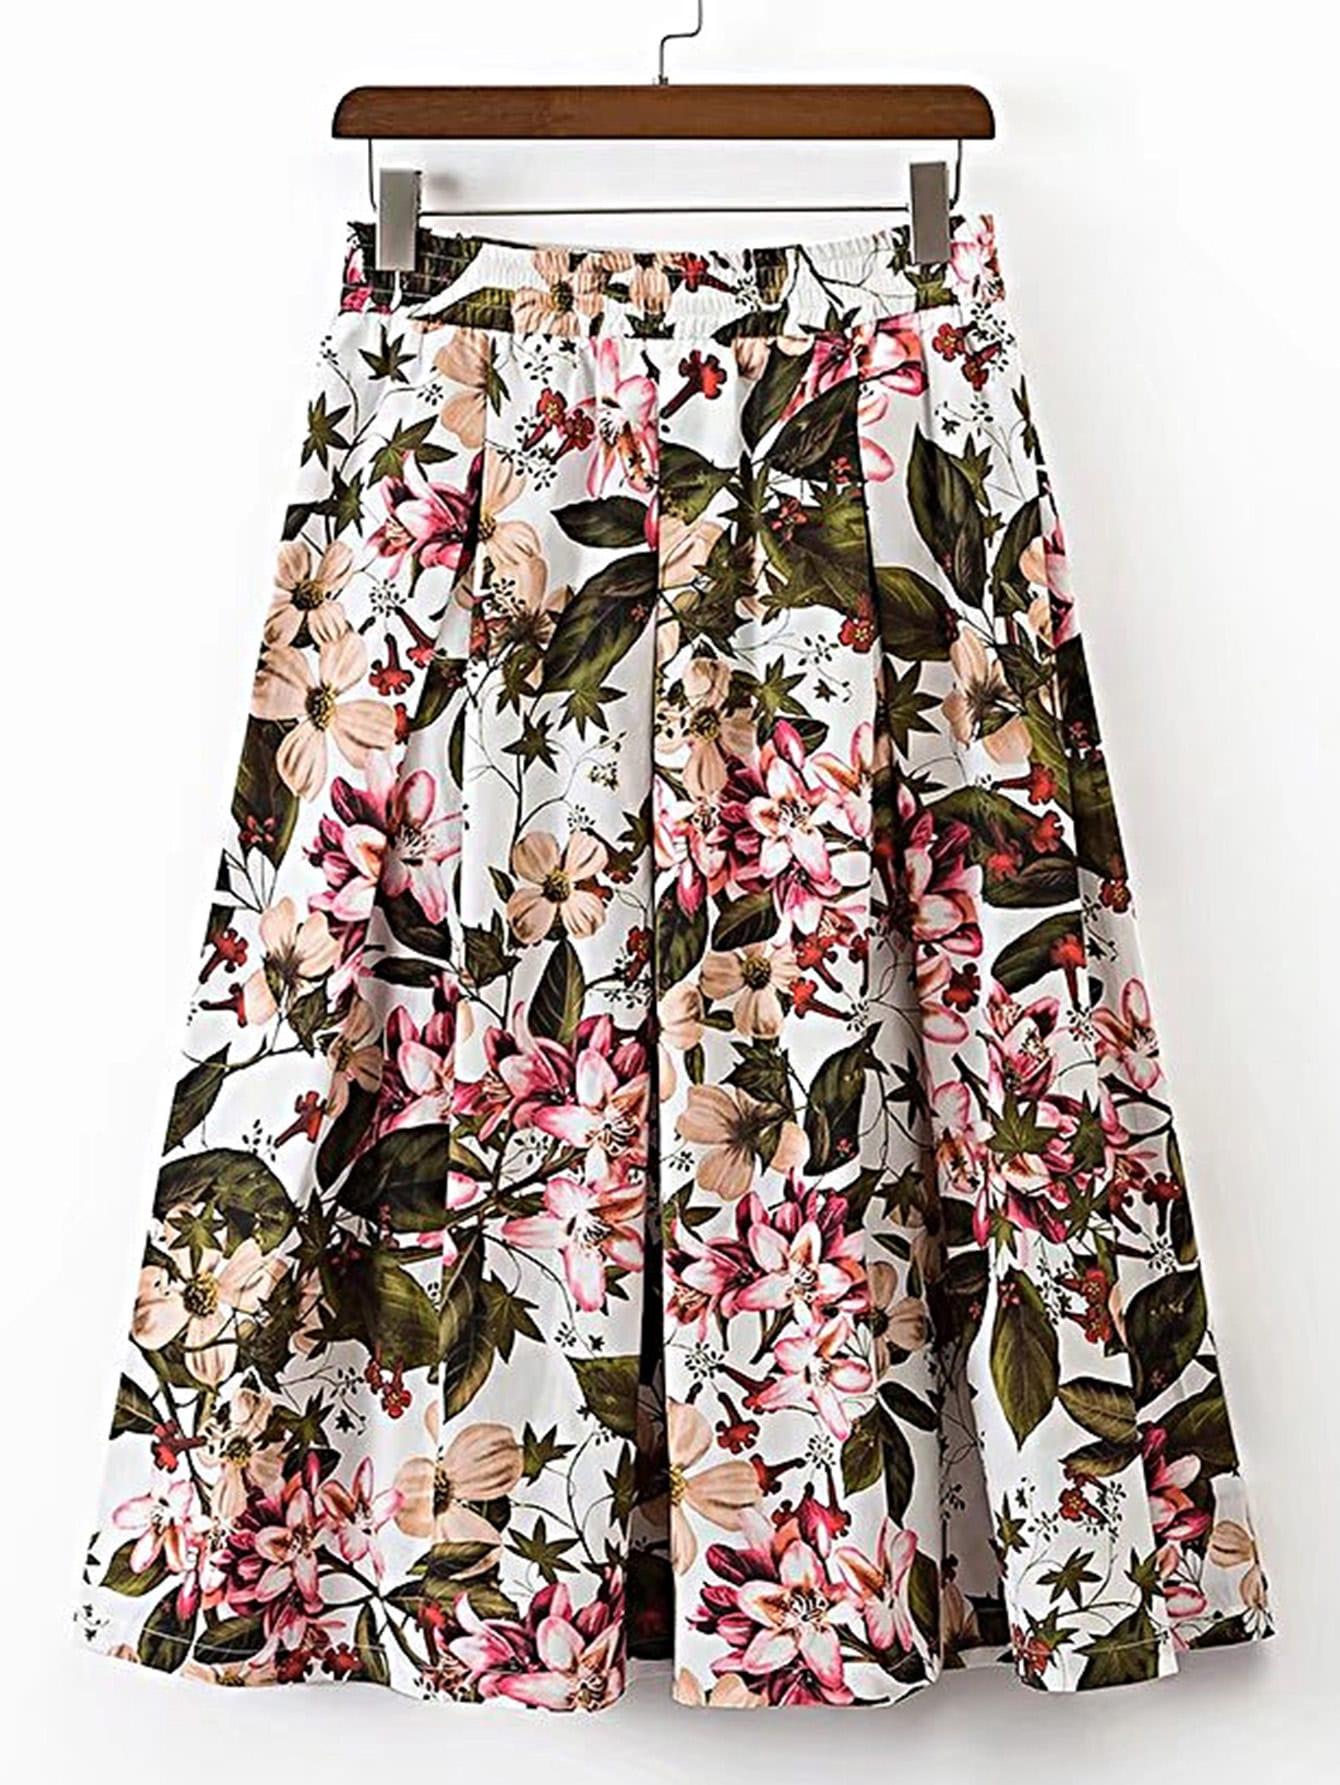 Elastic Waist Floral A Line Skirt skirt170509201